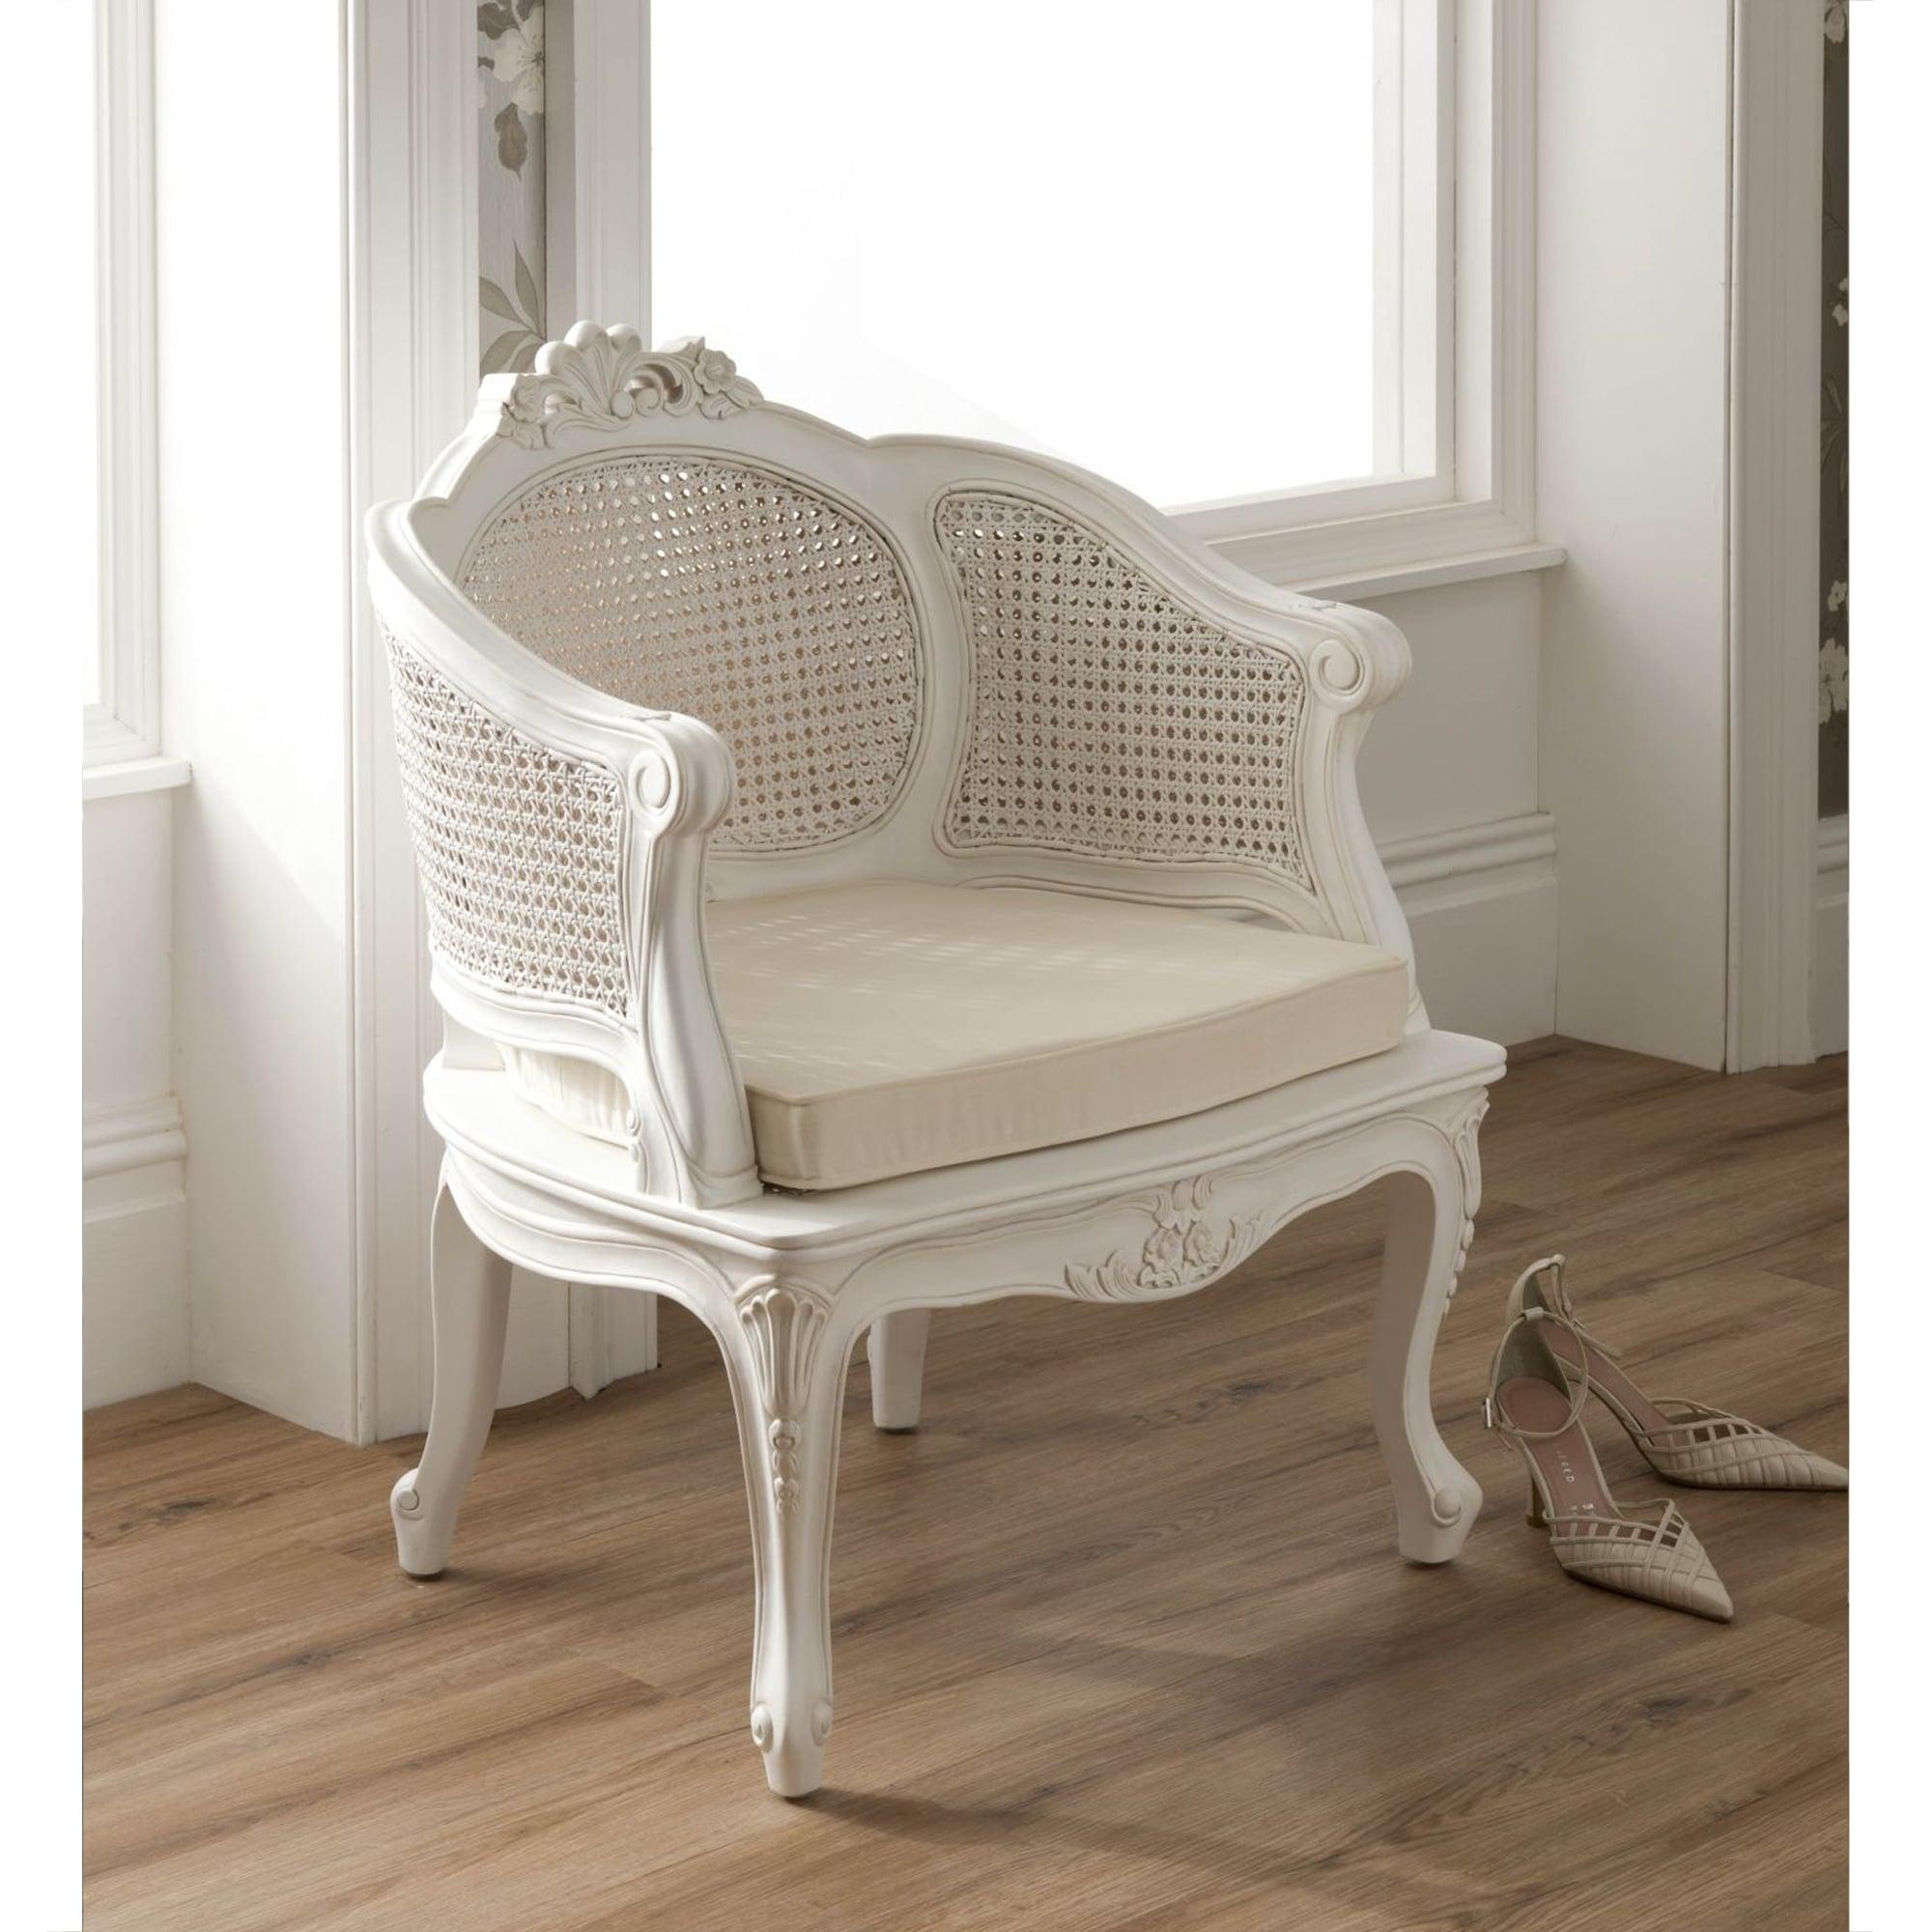 La Rochelle Antique French Rattan Chair